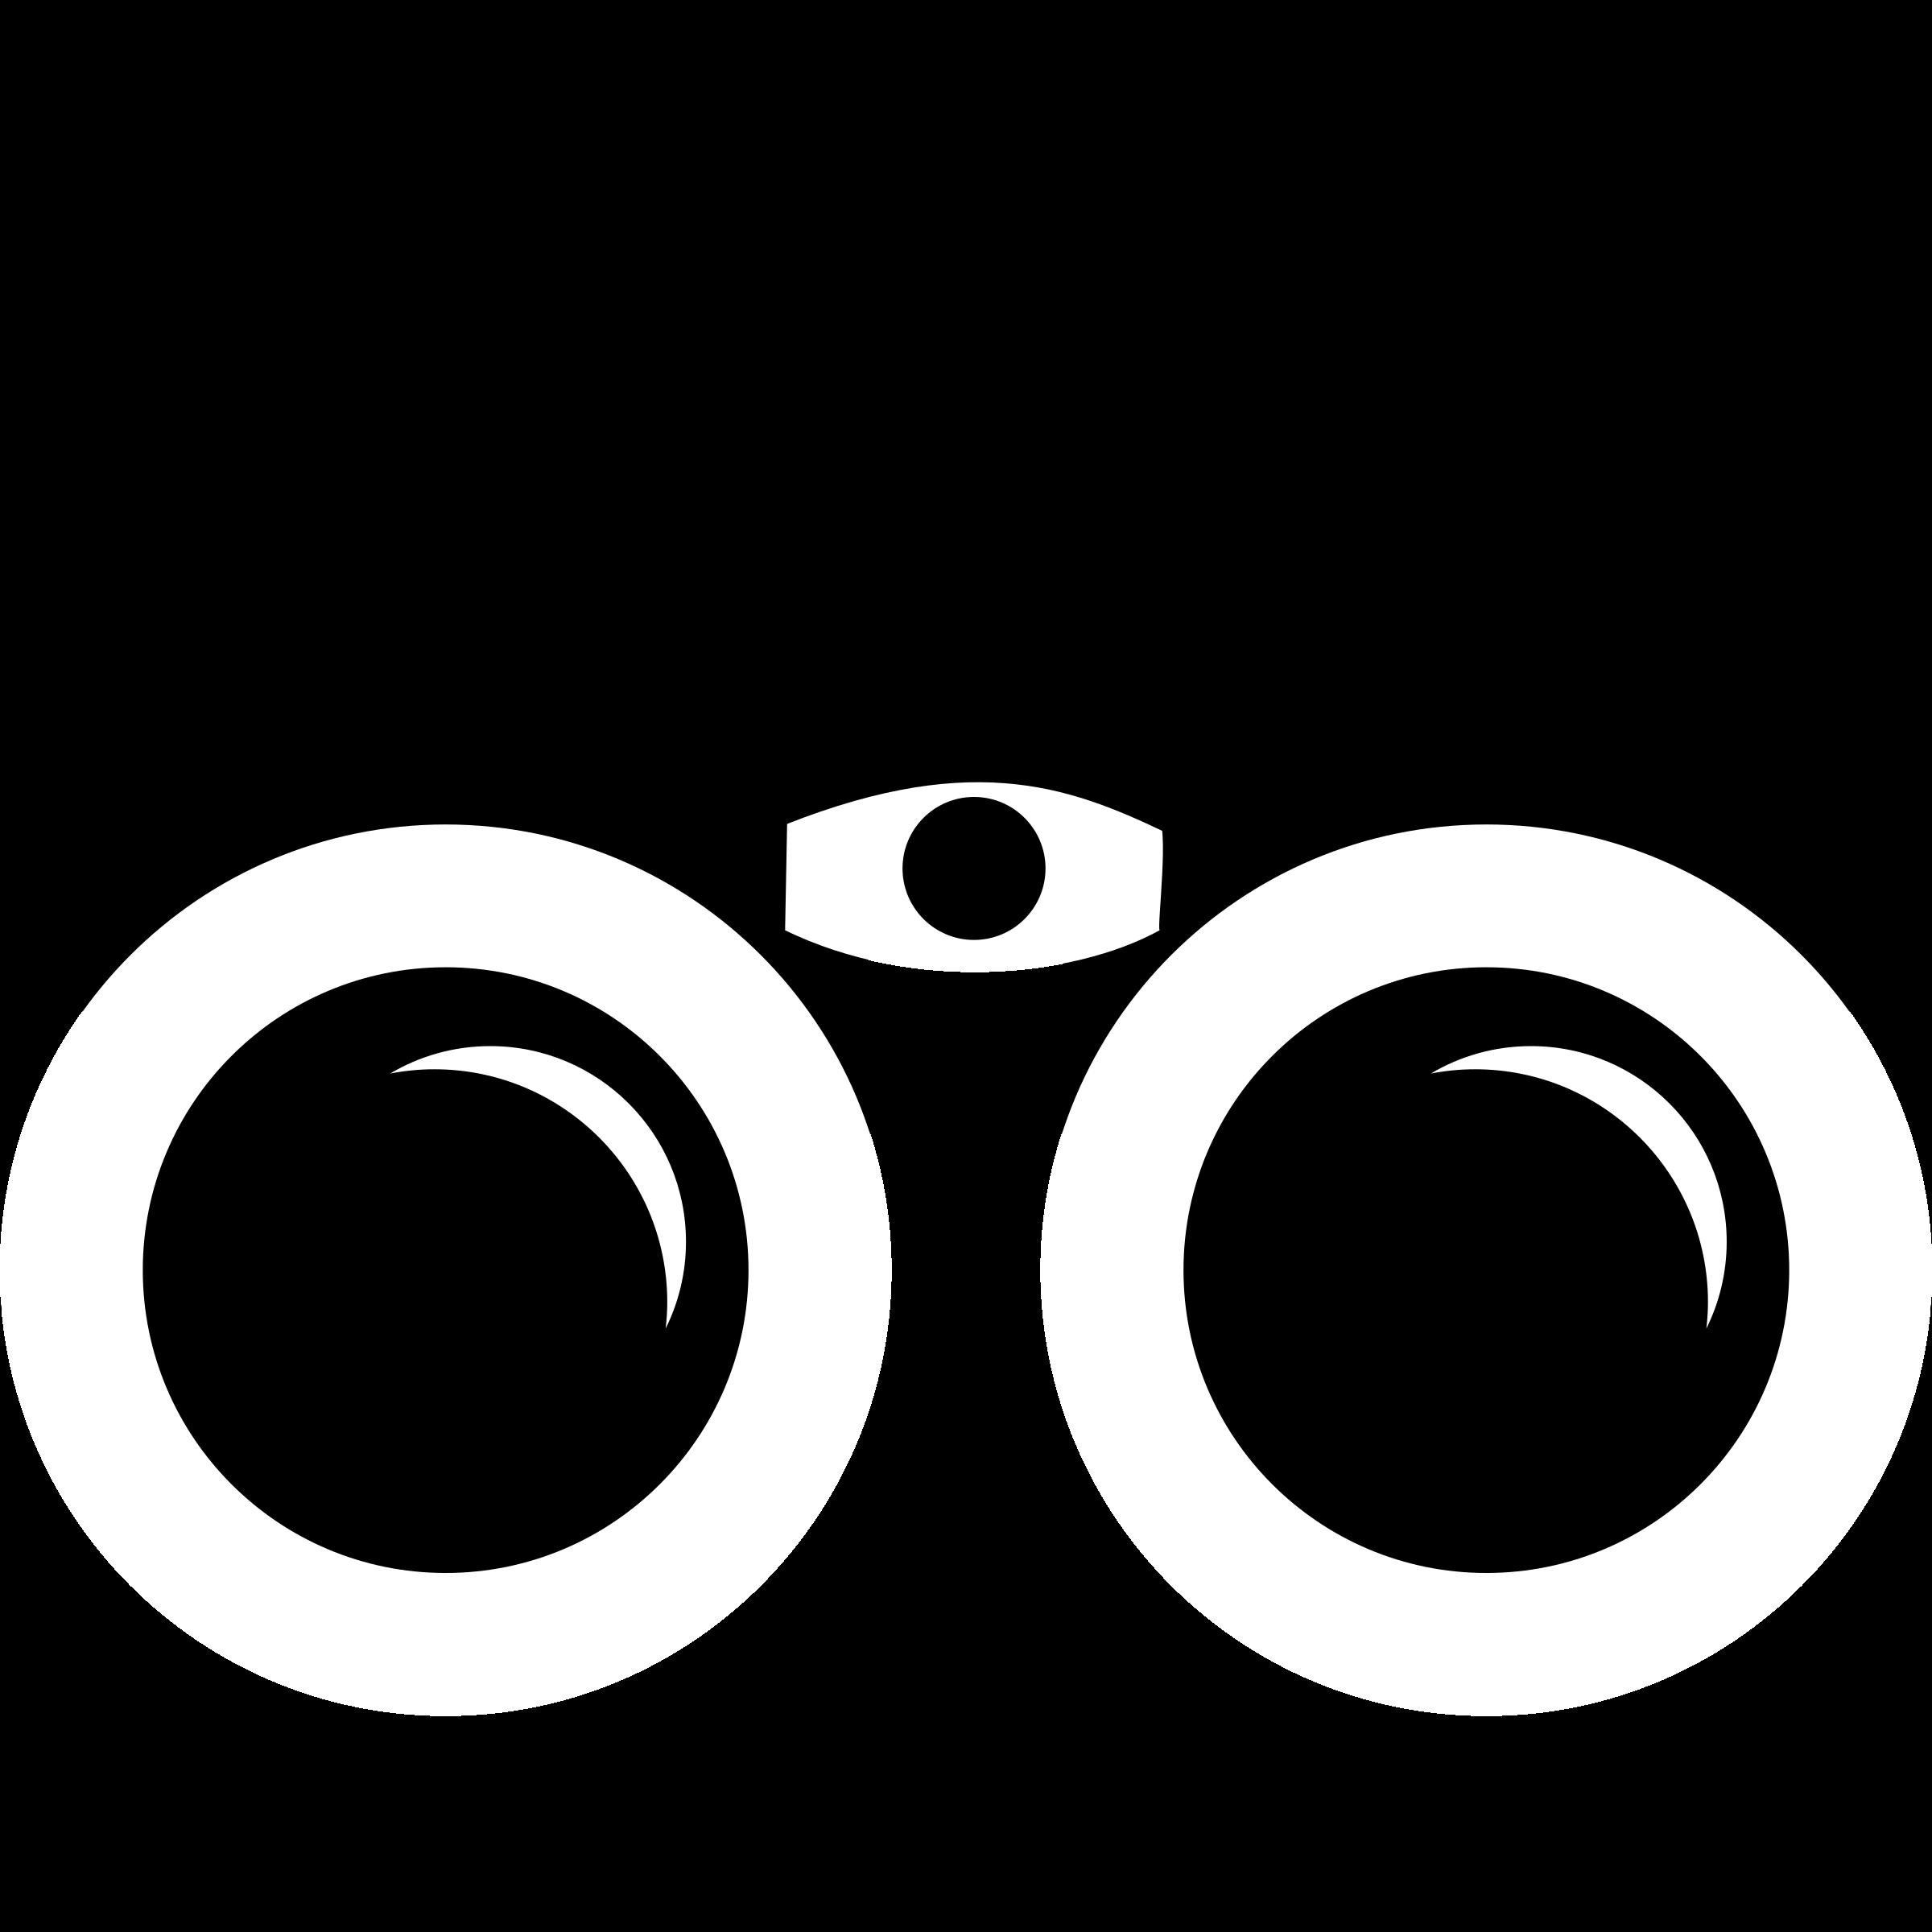 jpg library download Binocular clipart. Big image png